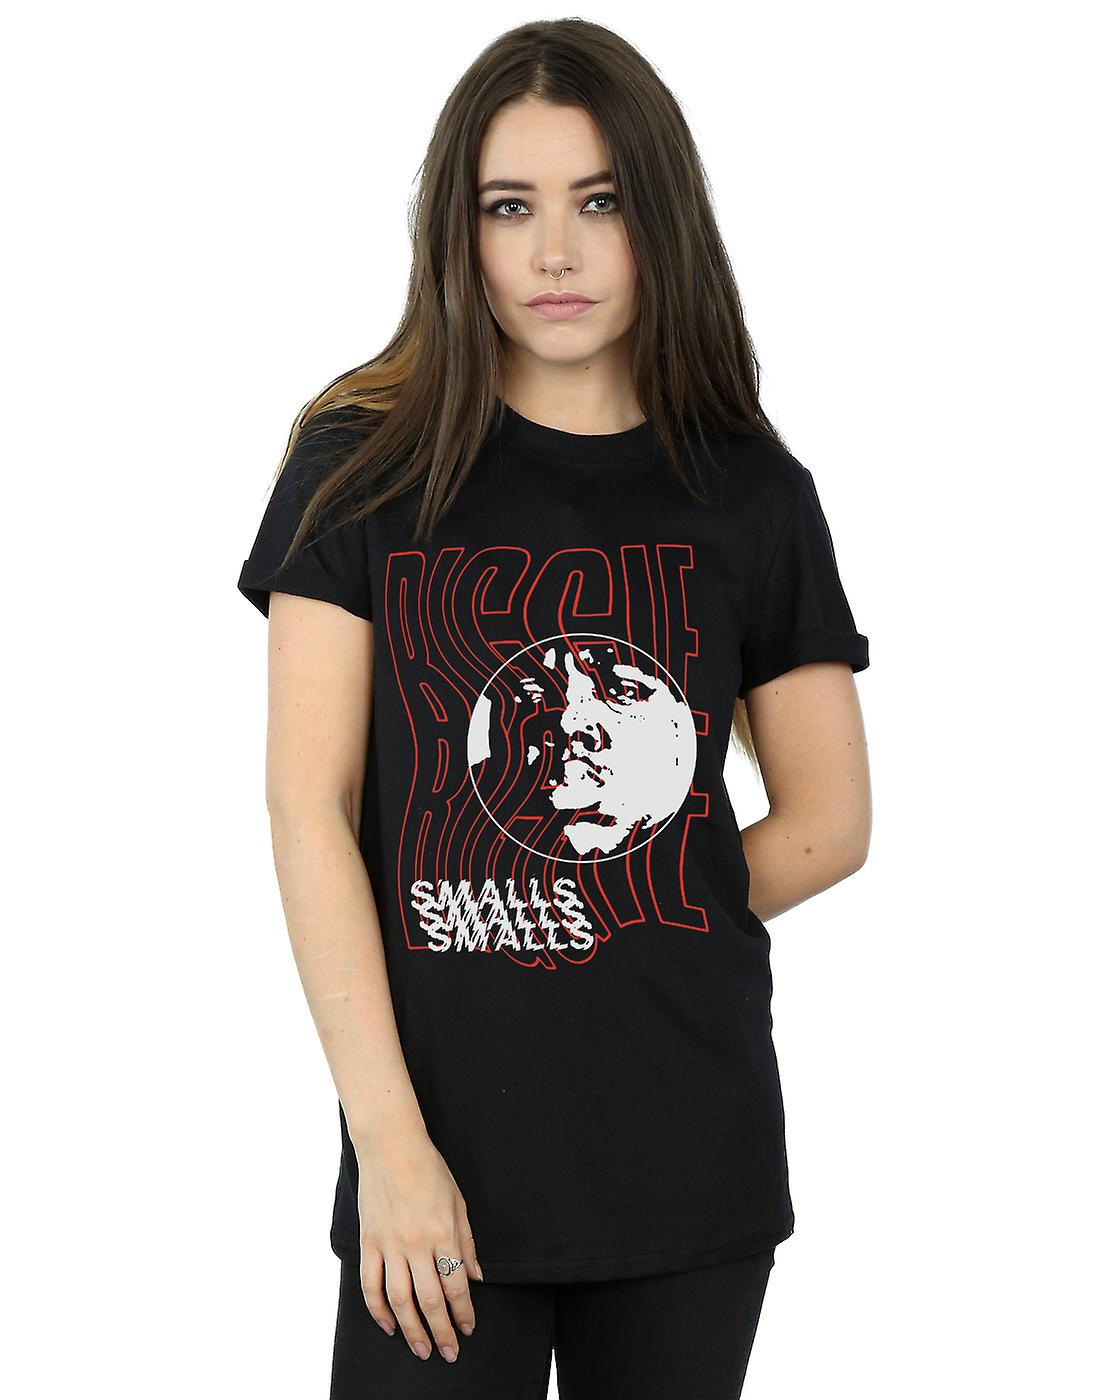 Notorious BIG Women's Biggie Glitch Boyfriend Fit T-Shirt